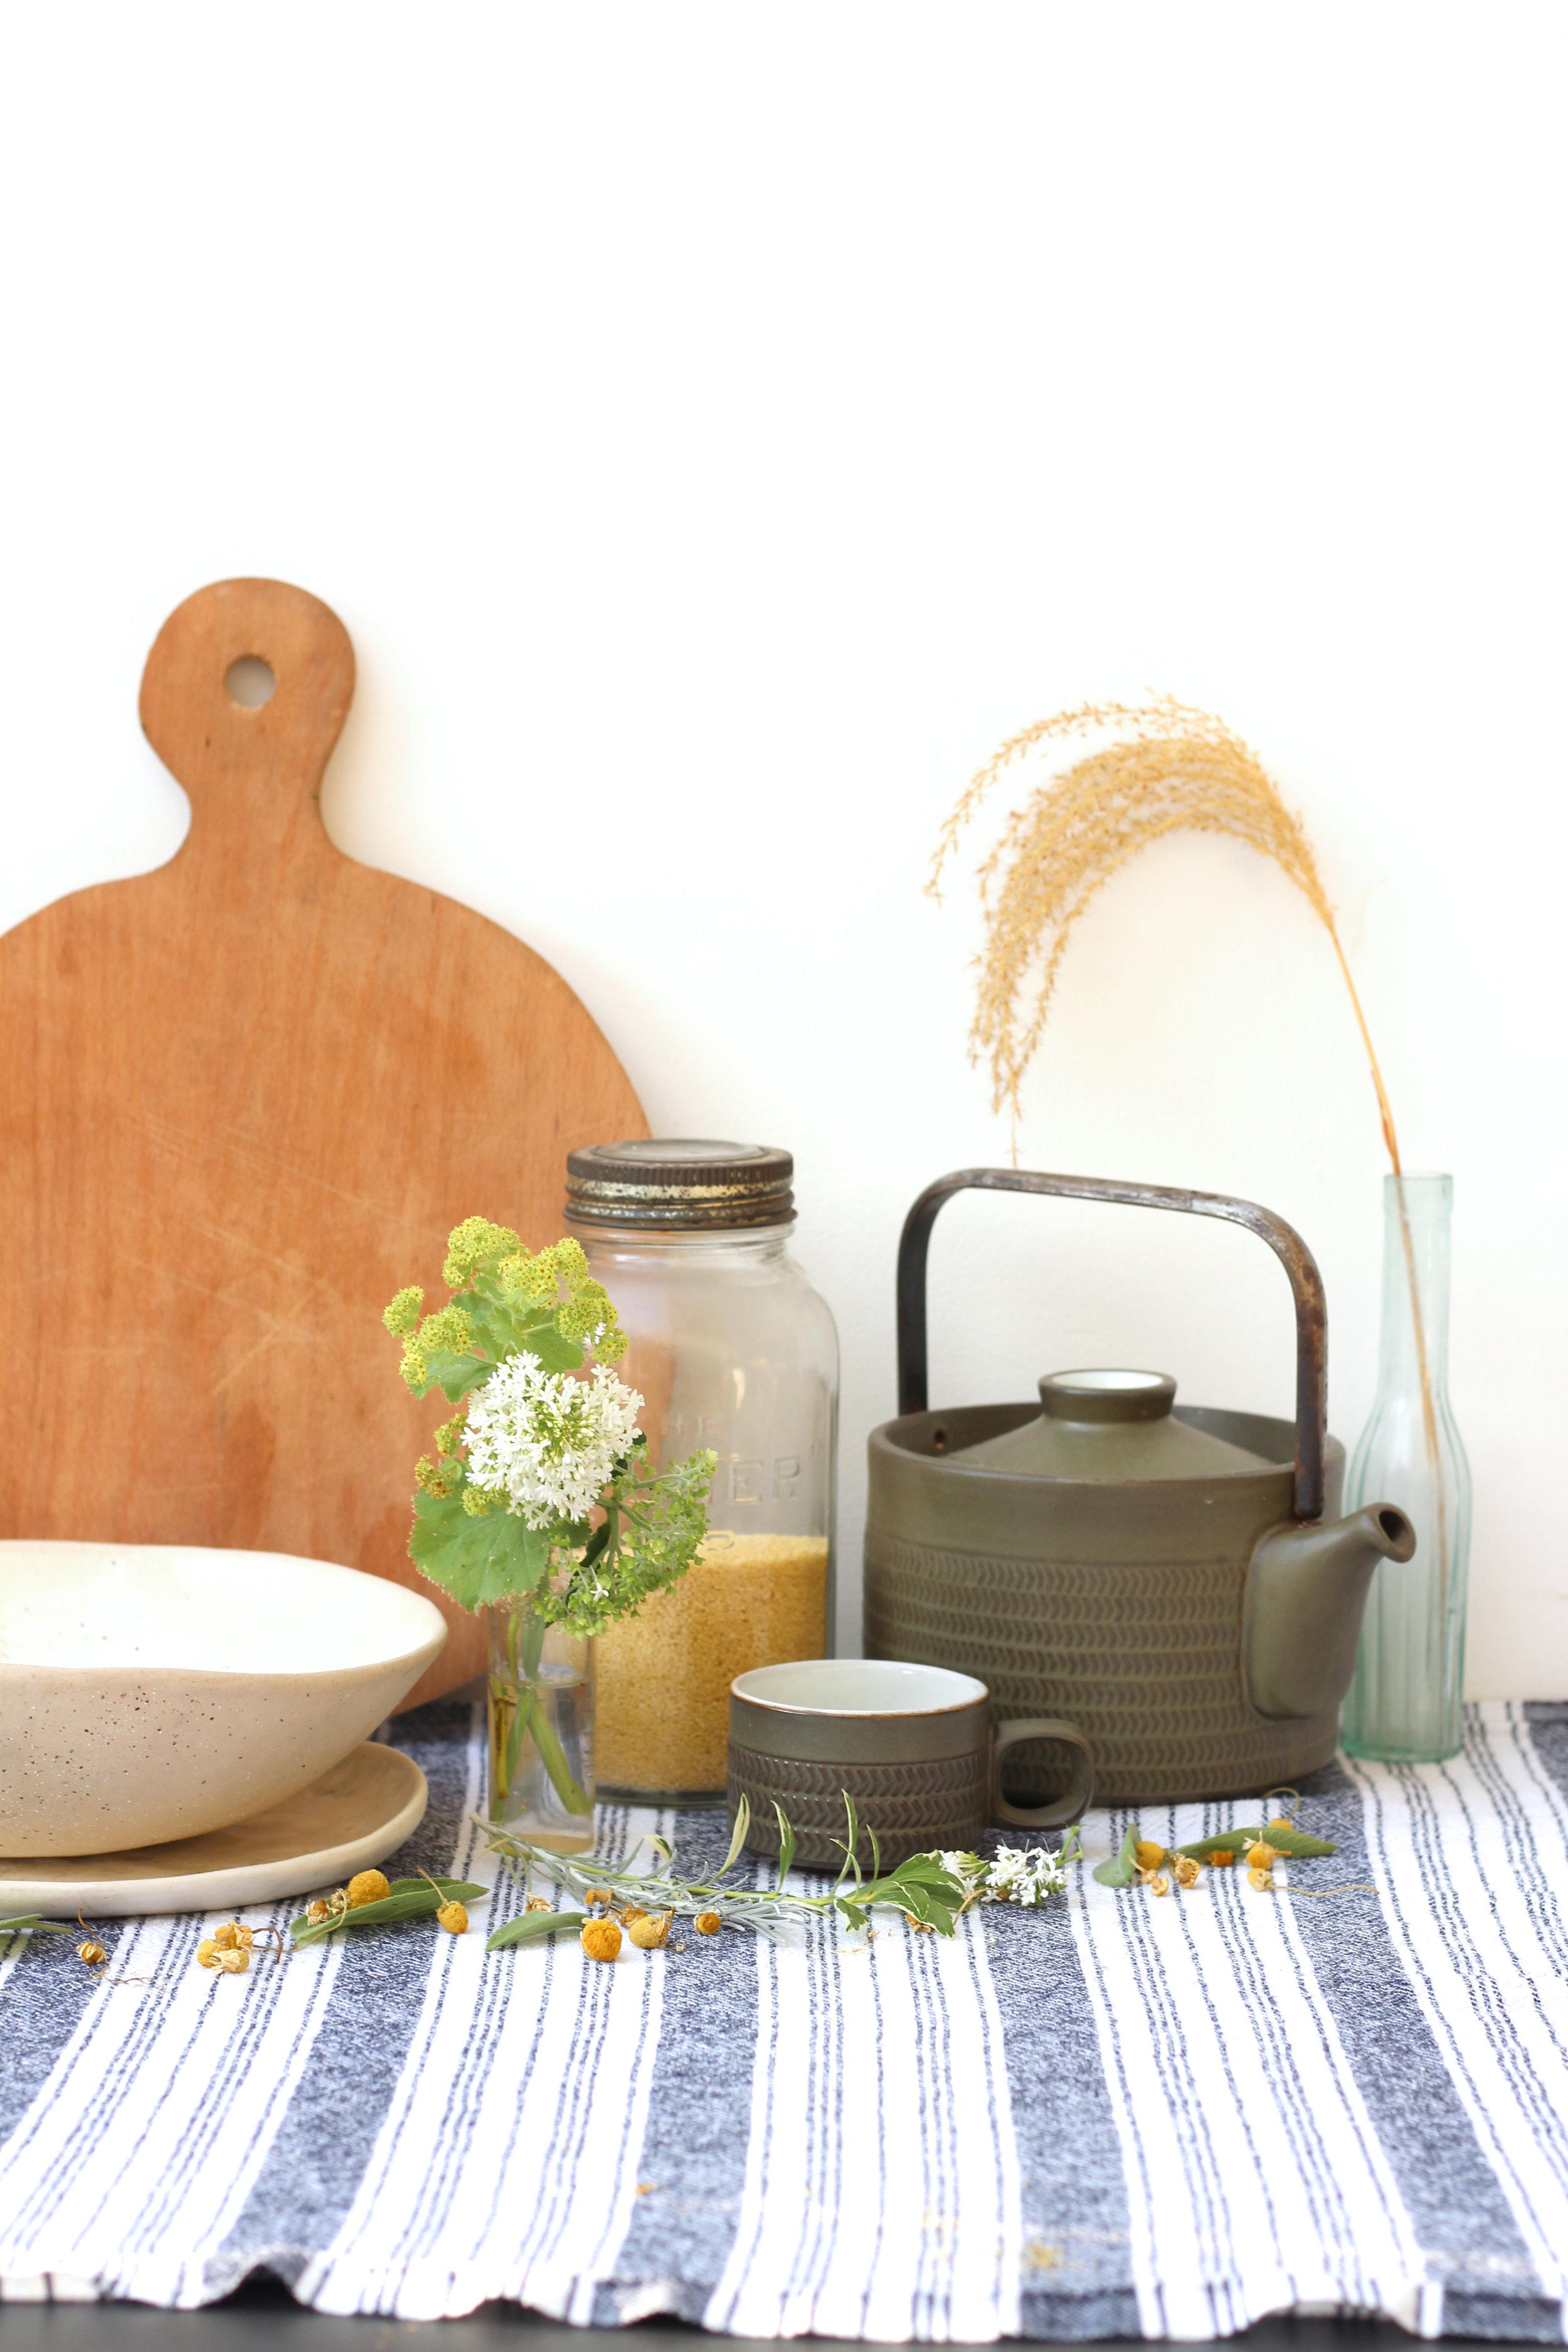 nancy-straughan-stylist-interior-kitchen-styling-natural-home.jpg